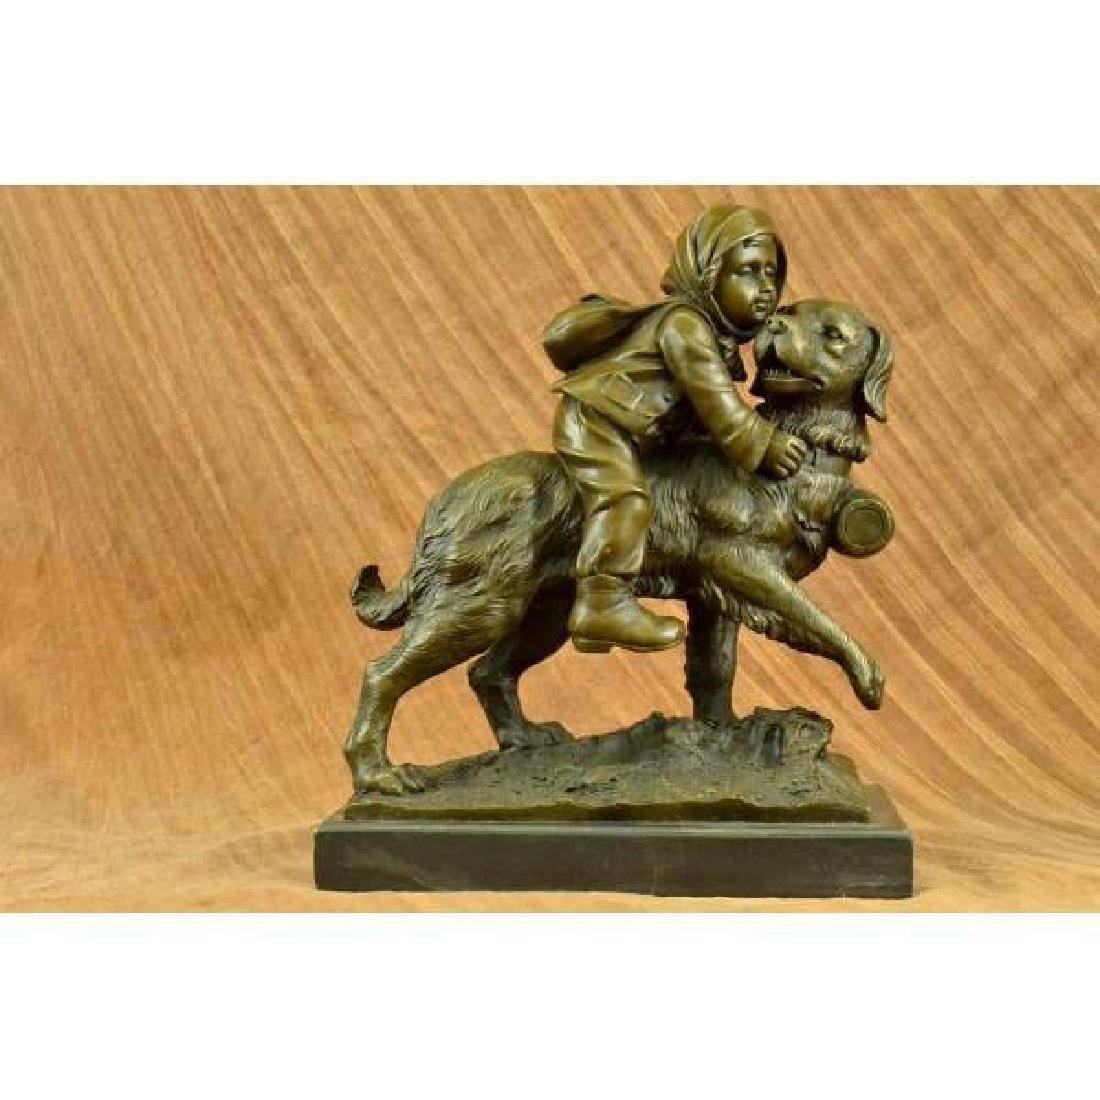 Chien Du St. Bernard by Guadez French Artist Bronze - 5